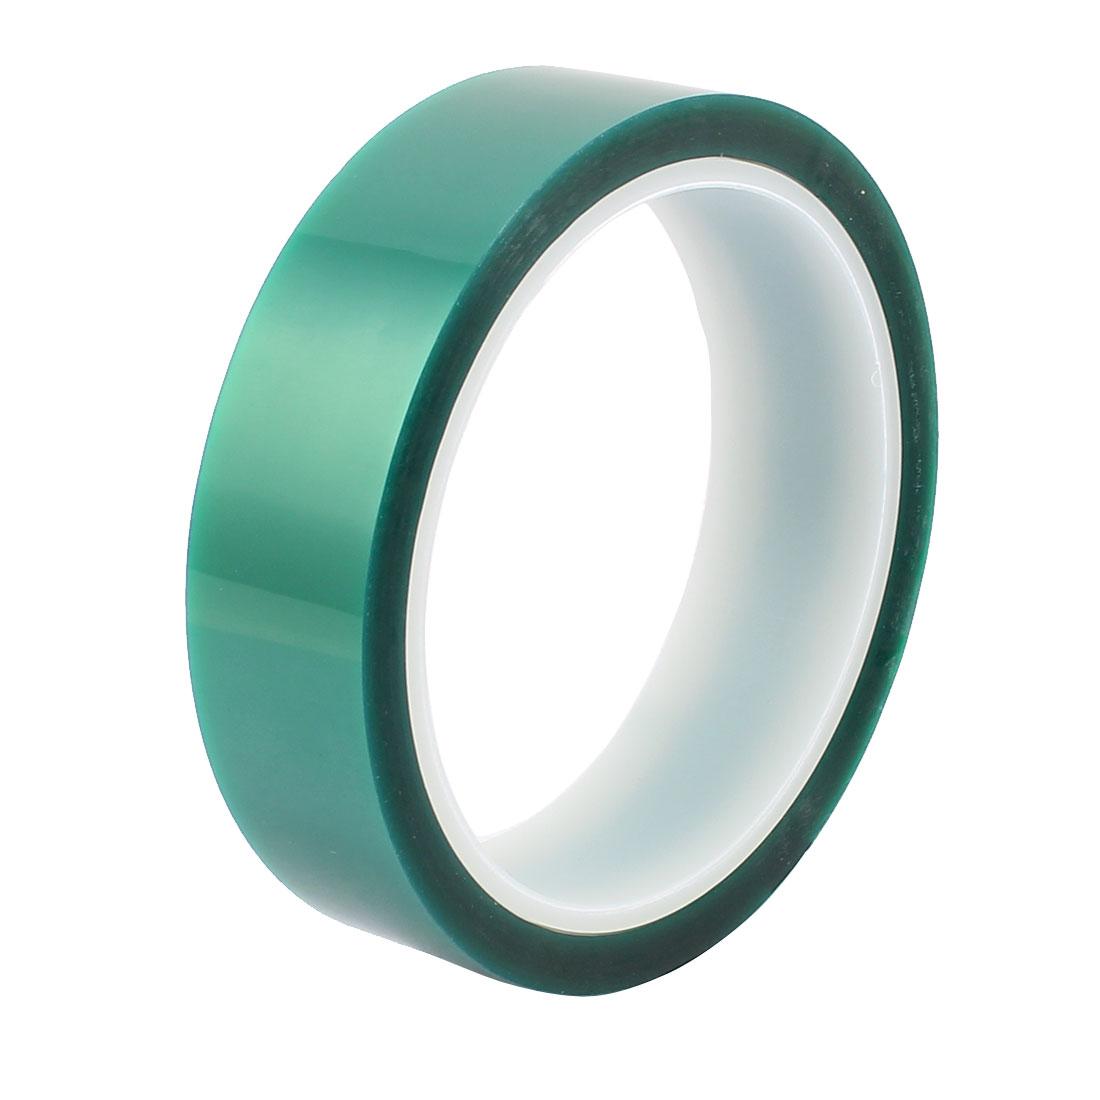 25mm Width 33M Length Green PET High Temperature Heat Resistant PCB Solder Tape